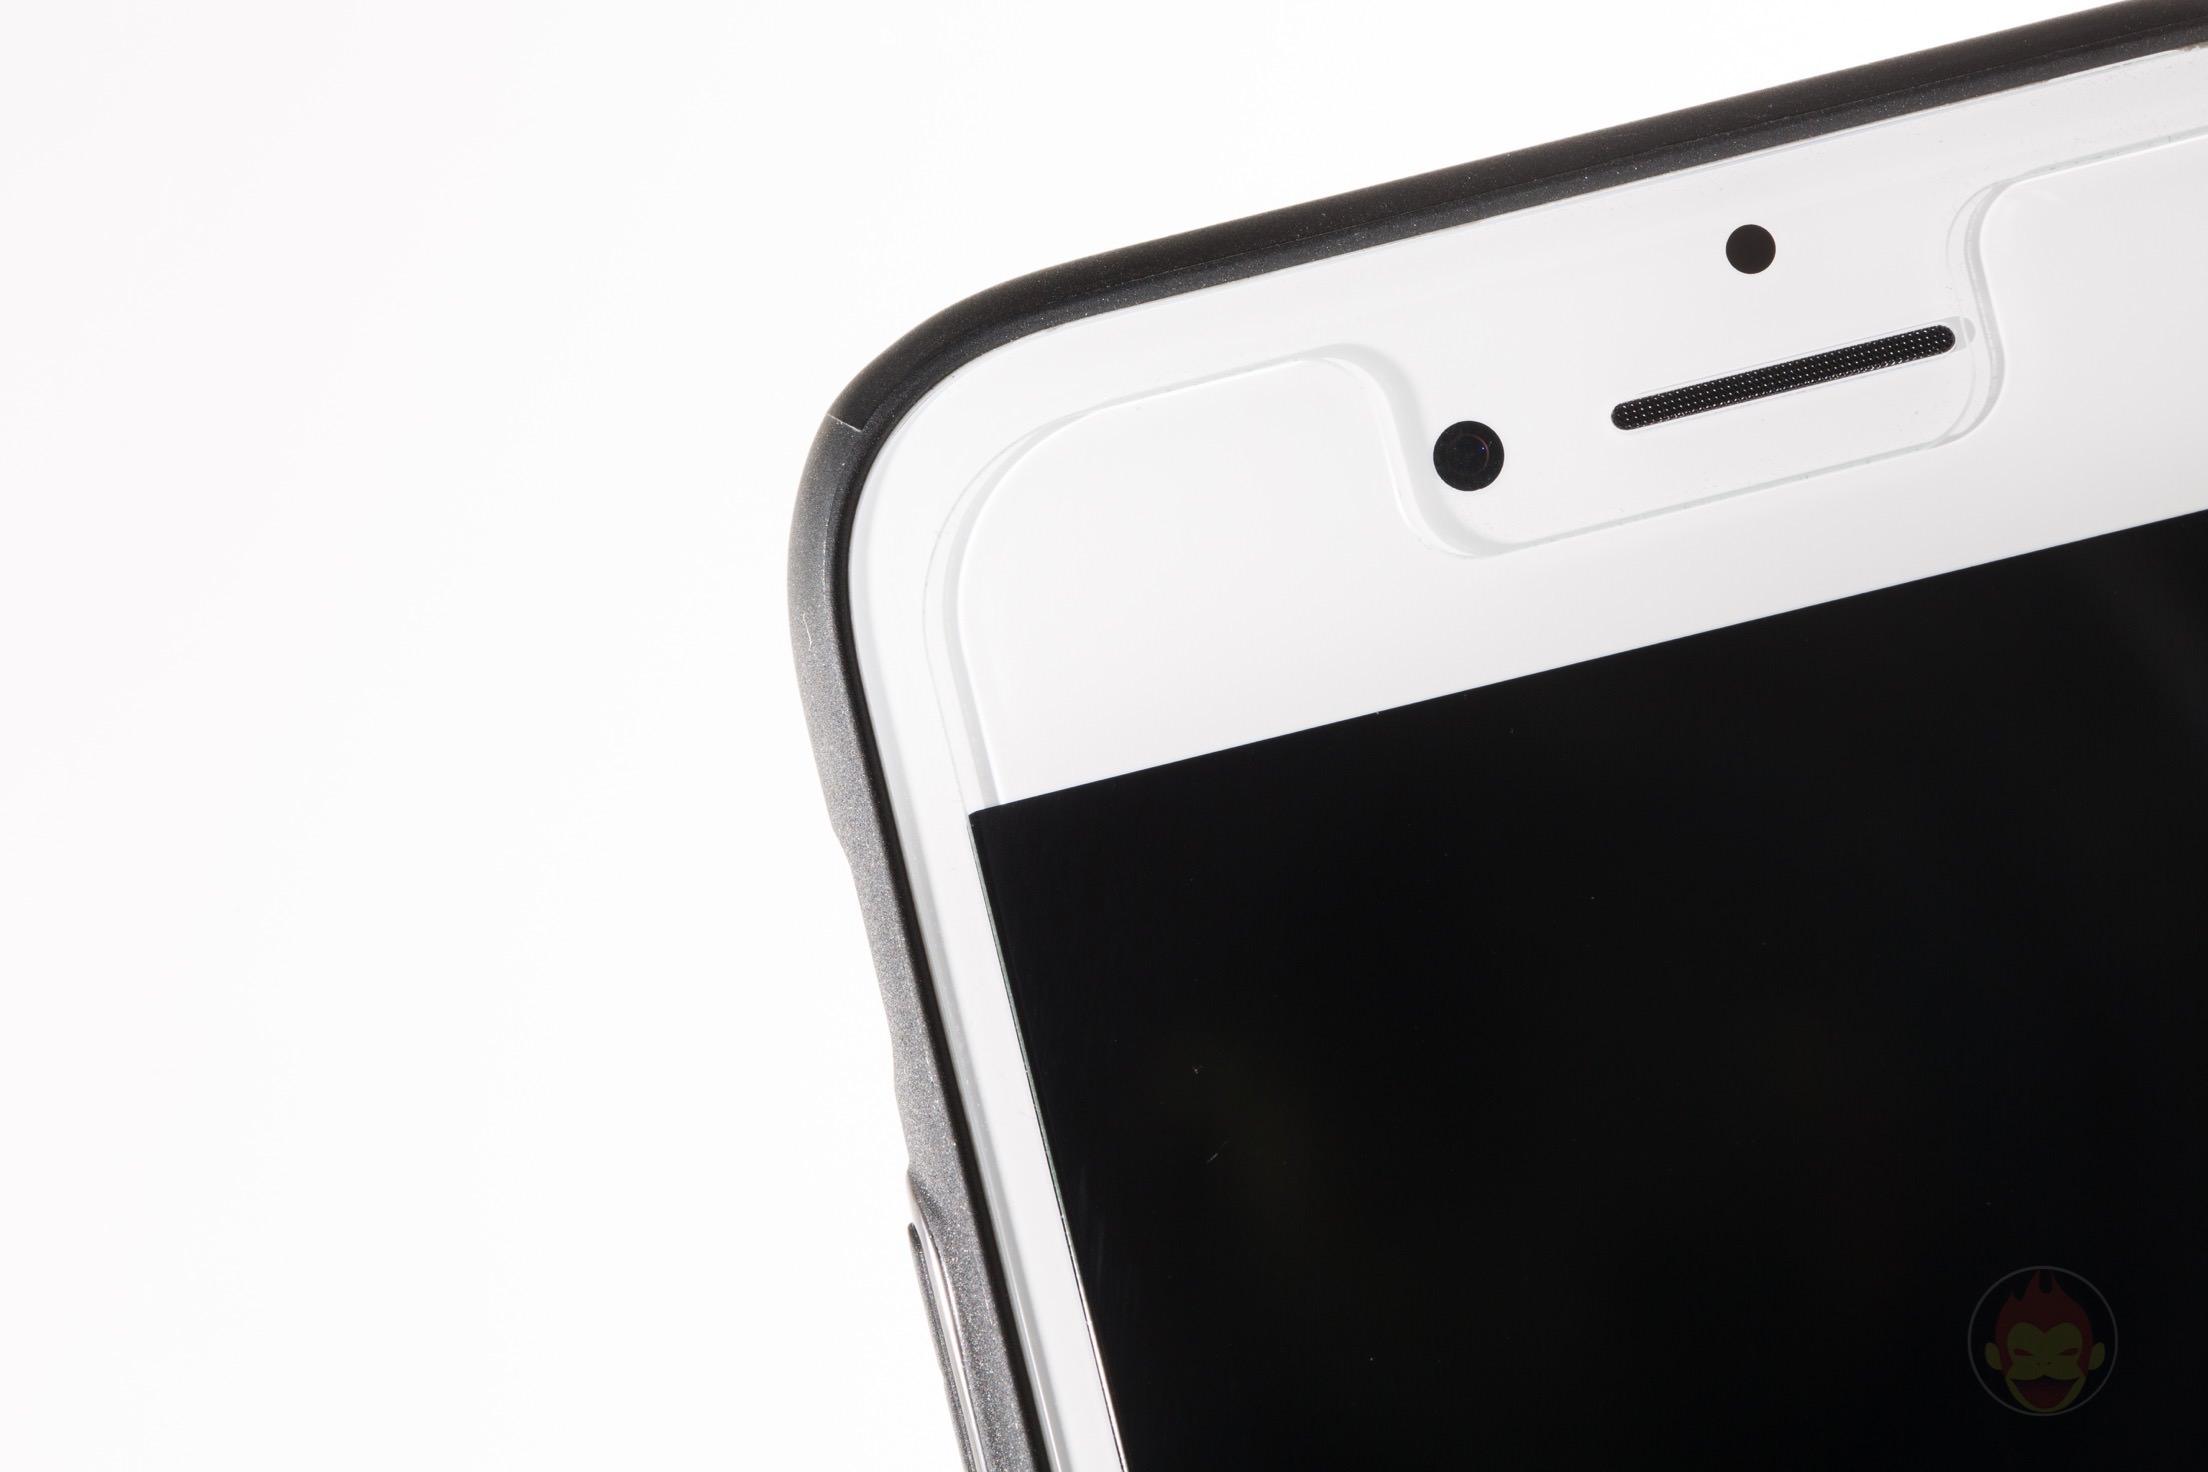 iPhone-7-Gold-Model-02.jpg